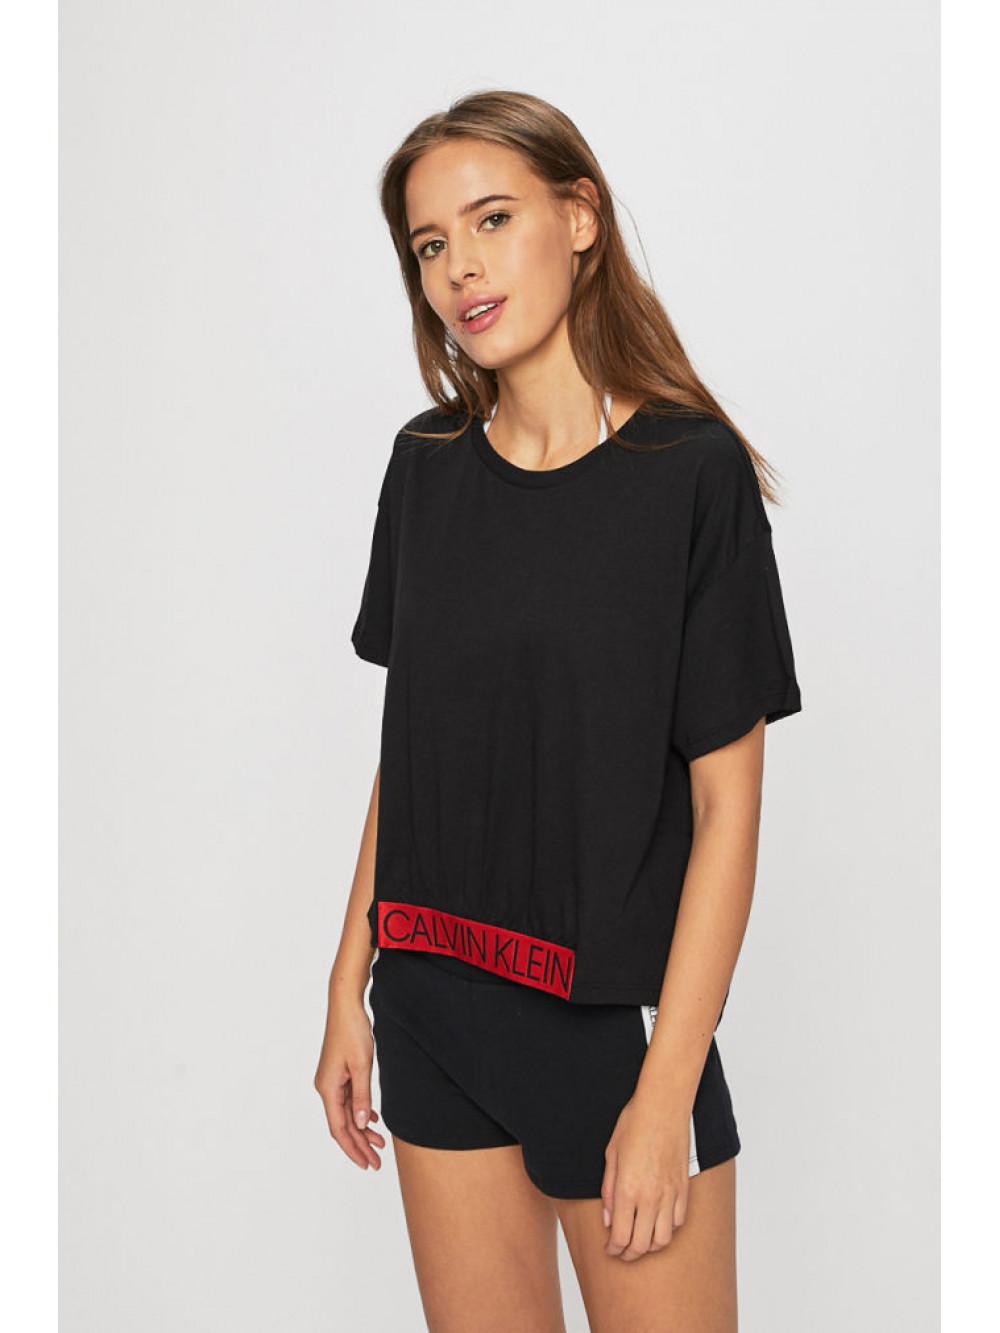 Dámske tričko Calvin Klein Cropped Tee čierne